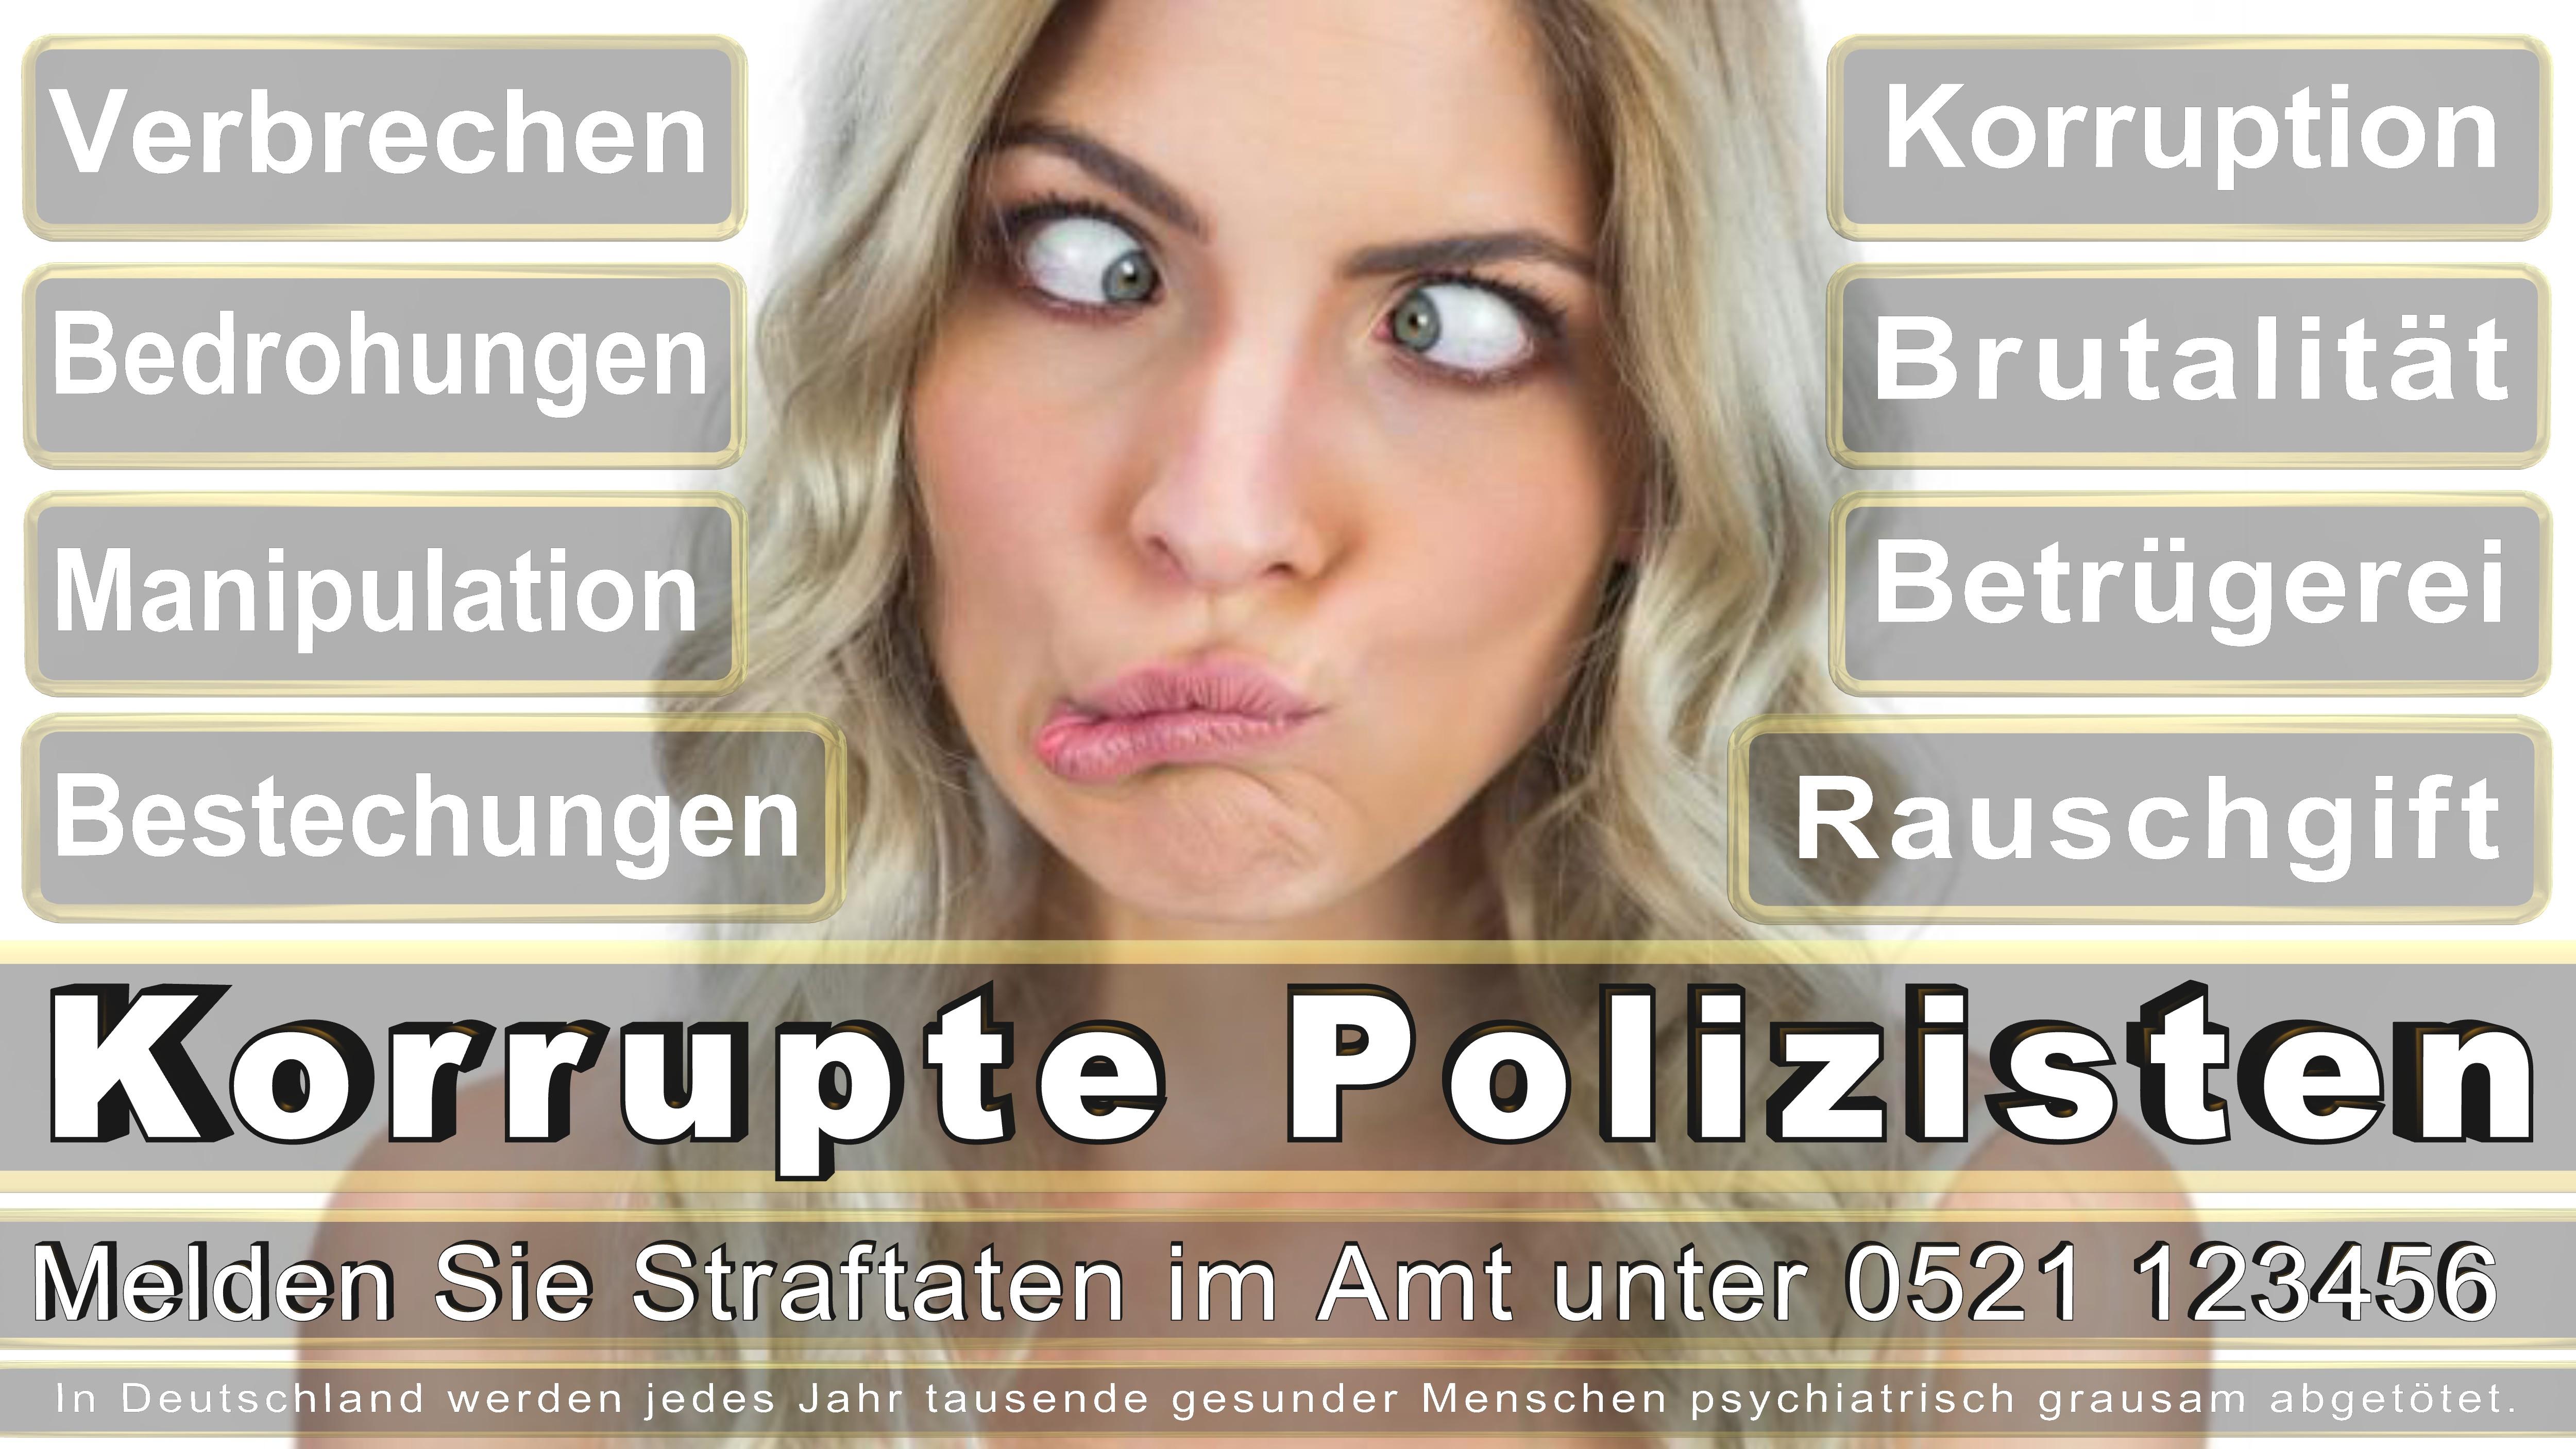 Polizei-Bielefeld-Polizei-Bielefeld-Polizei-Bielefeld (192)